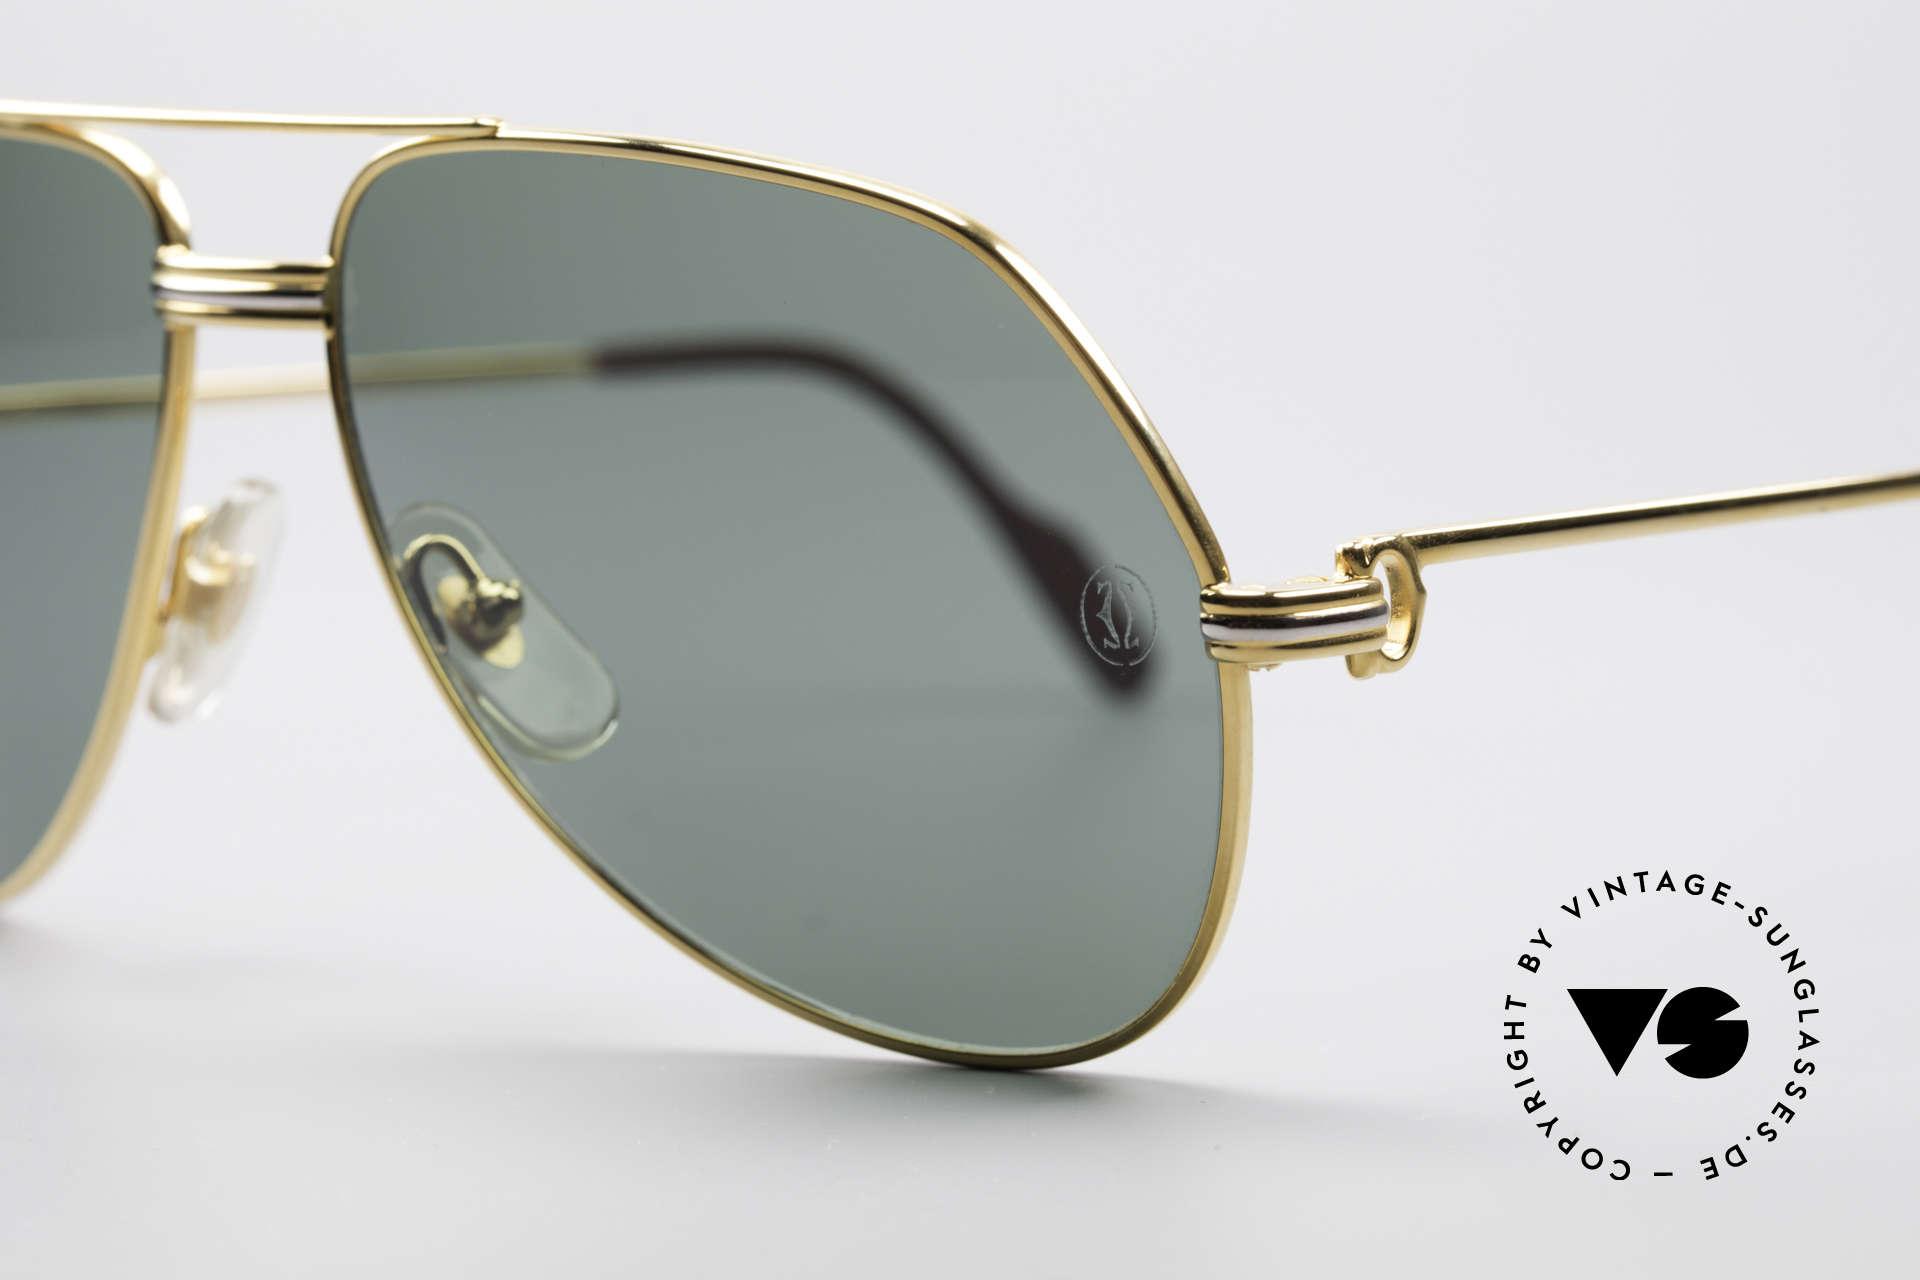 Cartier Vendome LC - M David Bowie Sunglasses, luxury frame (22ct) with ORIGINAL sun lenses with logo, Made for Men